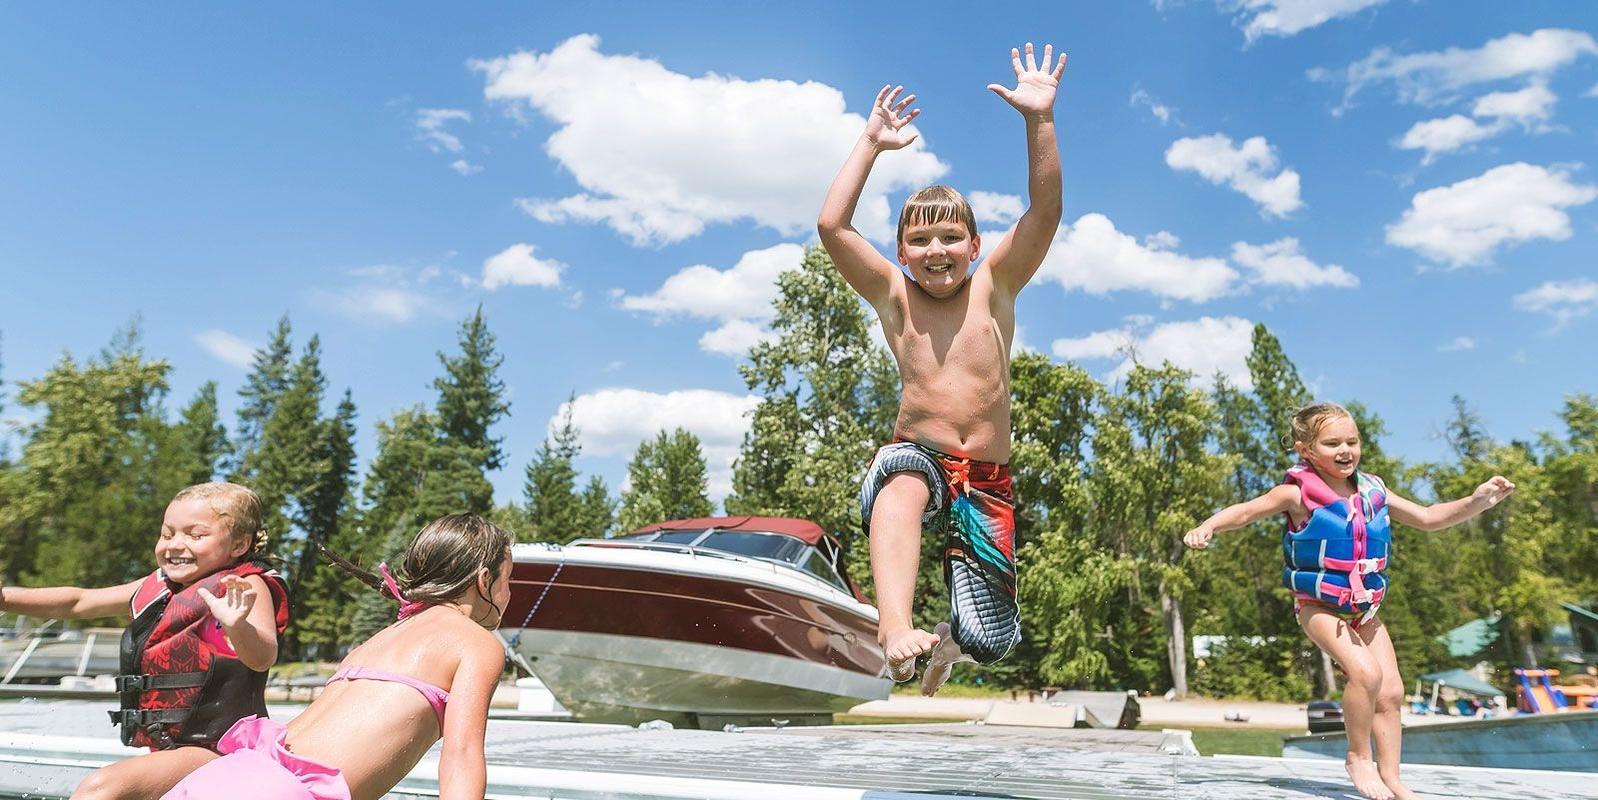 Kids having fun swimming on their home beside water